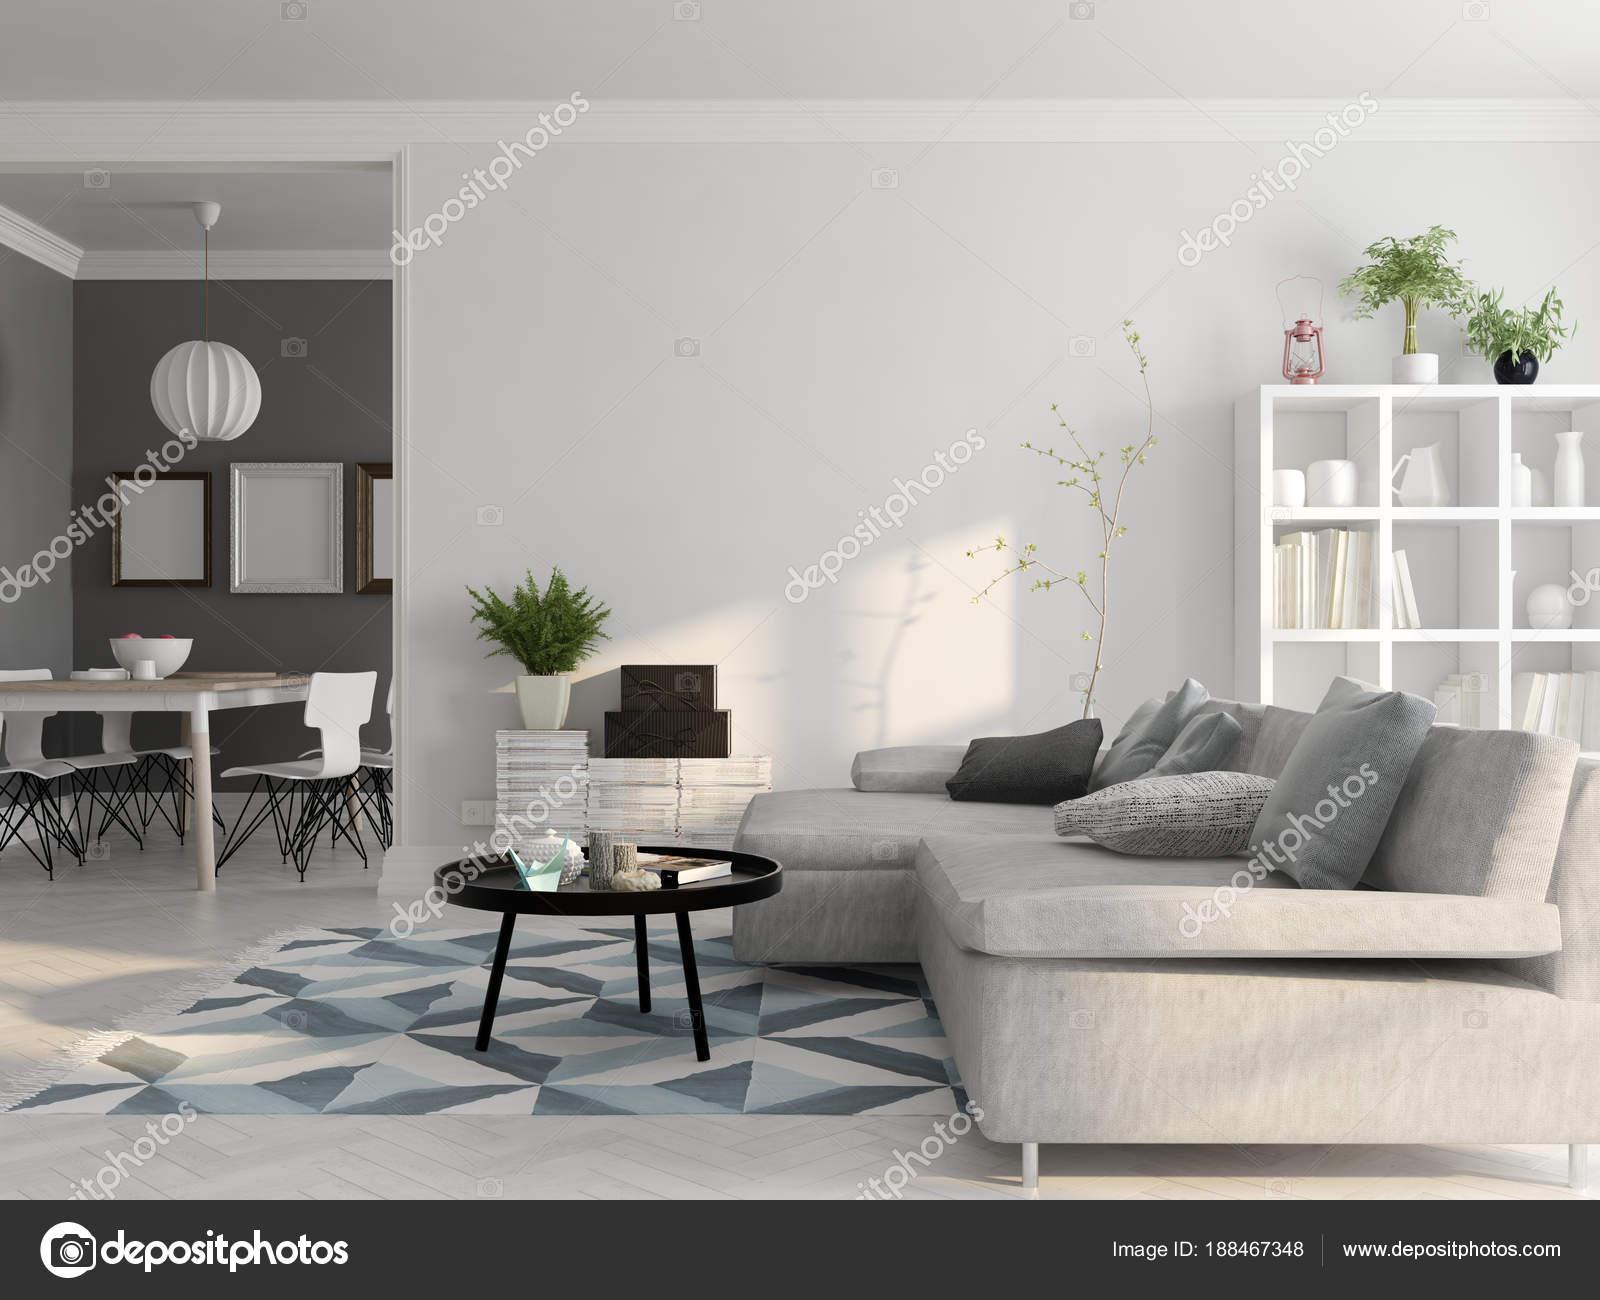 Skandinavischen Stil Innenarchitektur 3D-Rendering — Stockfoto ...